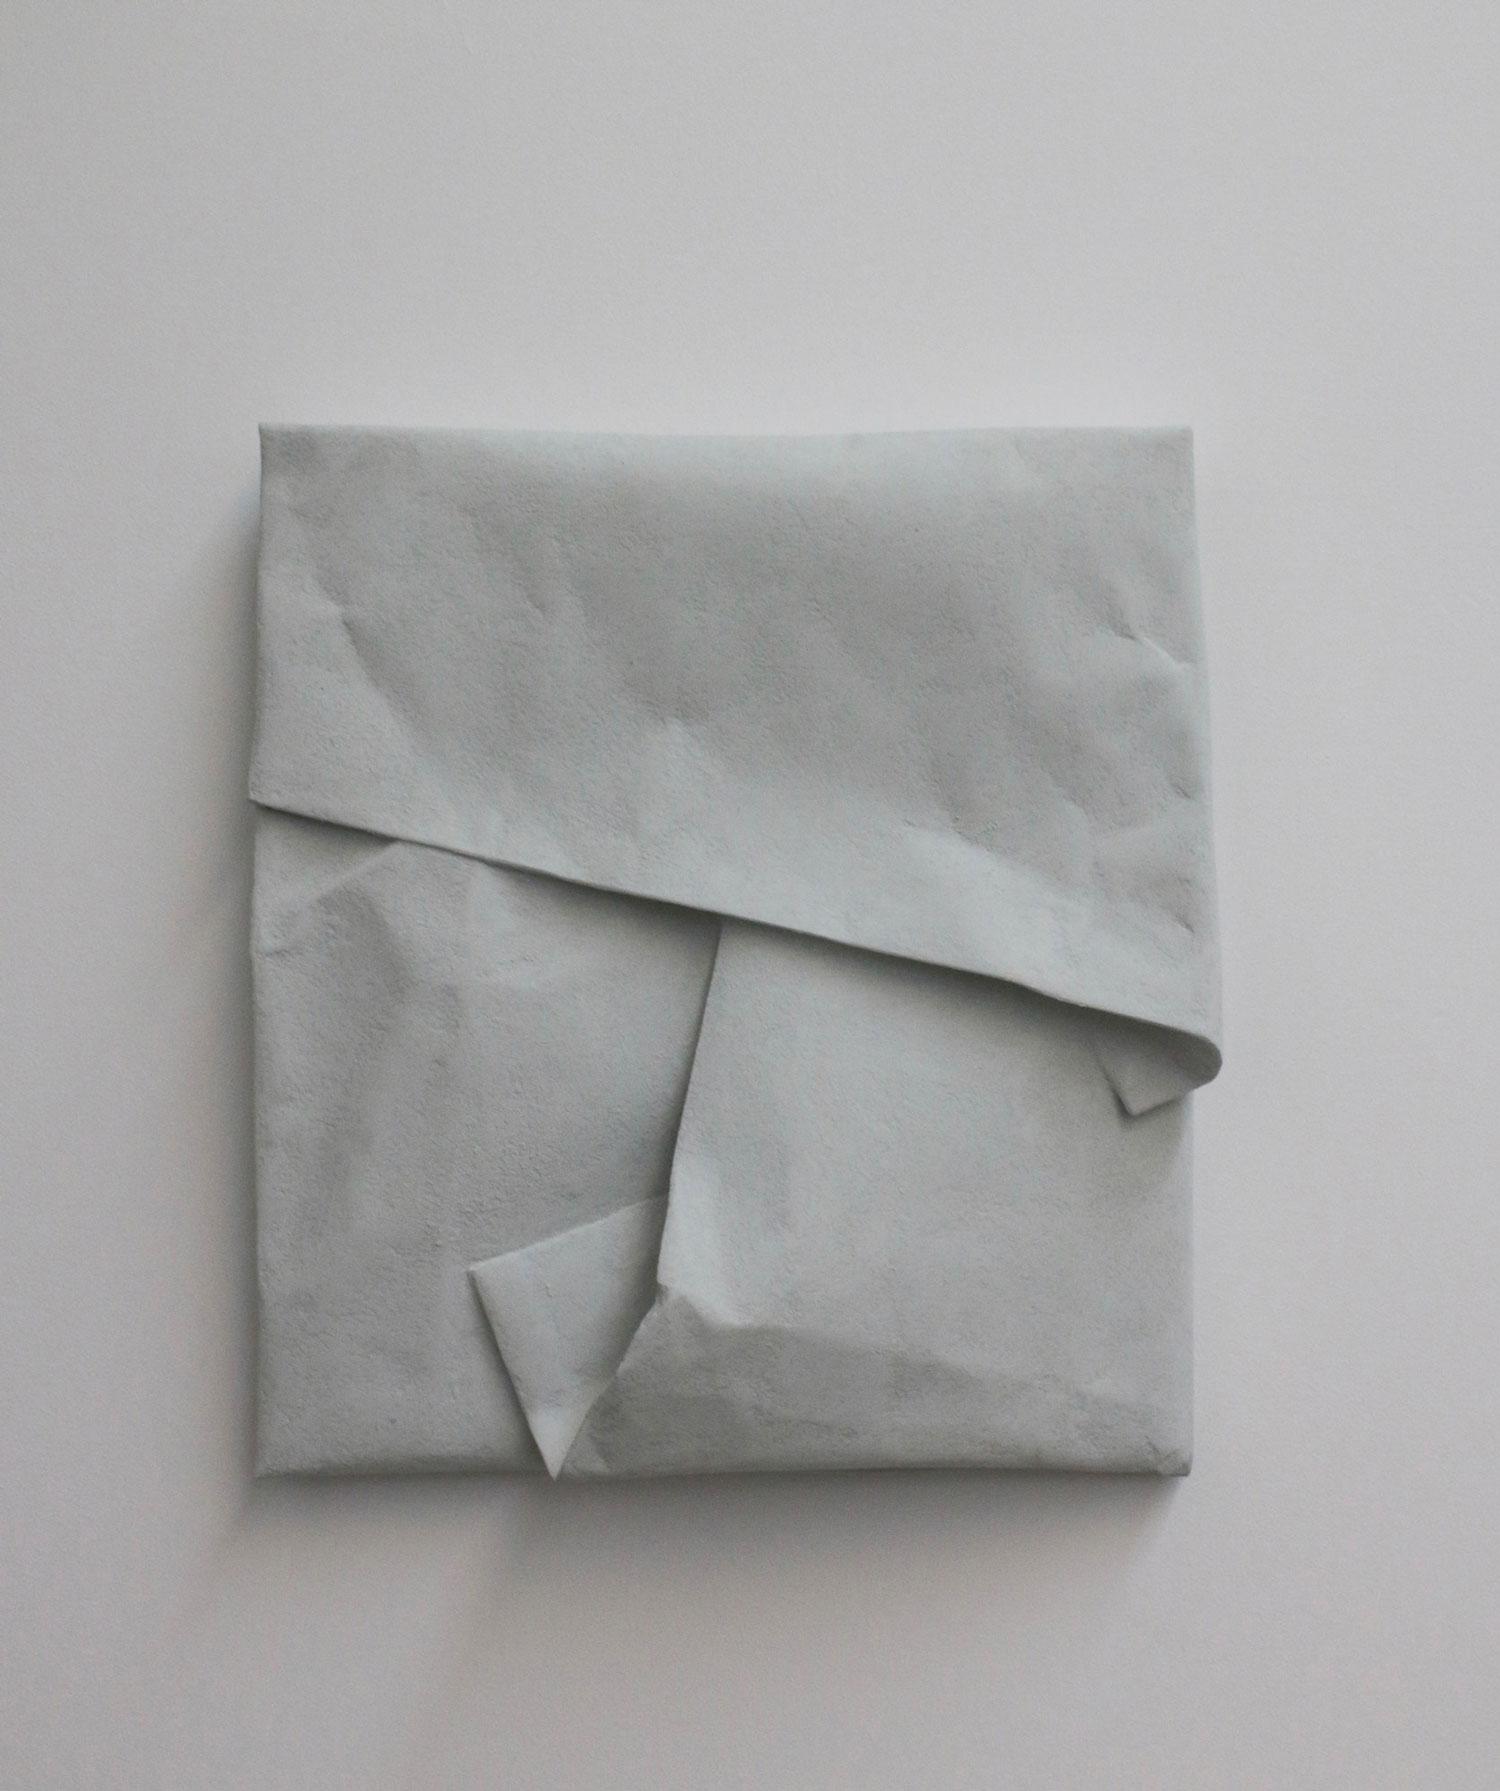 3.-Johan-De-Wit,-Untitled,-2021,-paper,-resins,-iron-powder,-pigments,-37-x-33-x-6-cm-_-Kristof-De-Clercq-gallery-_-JDW457-_-web